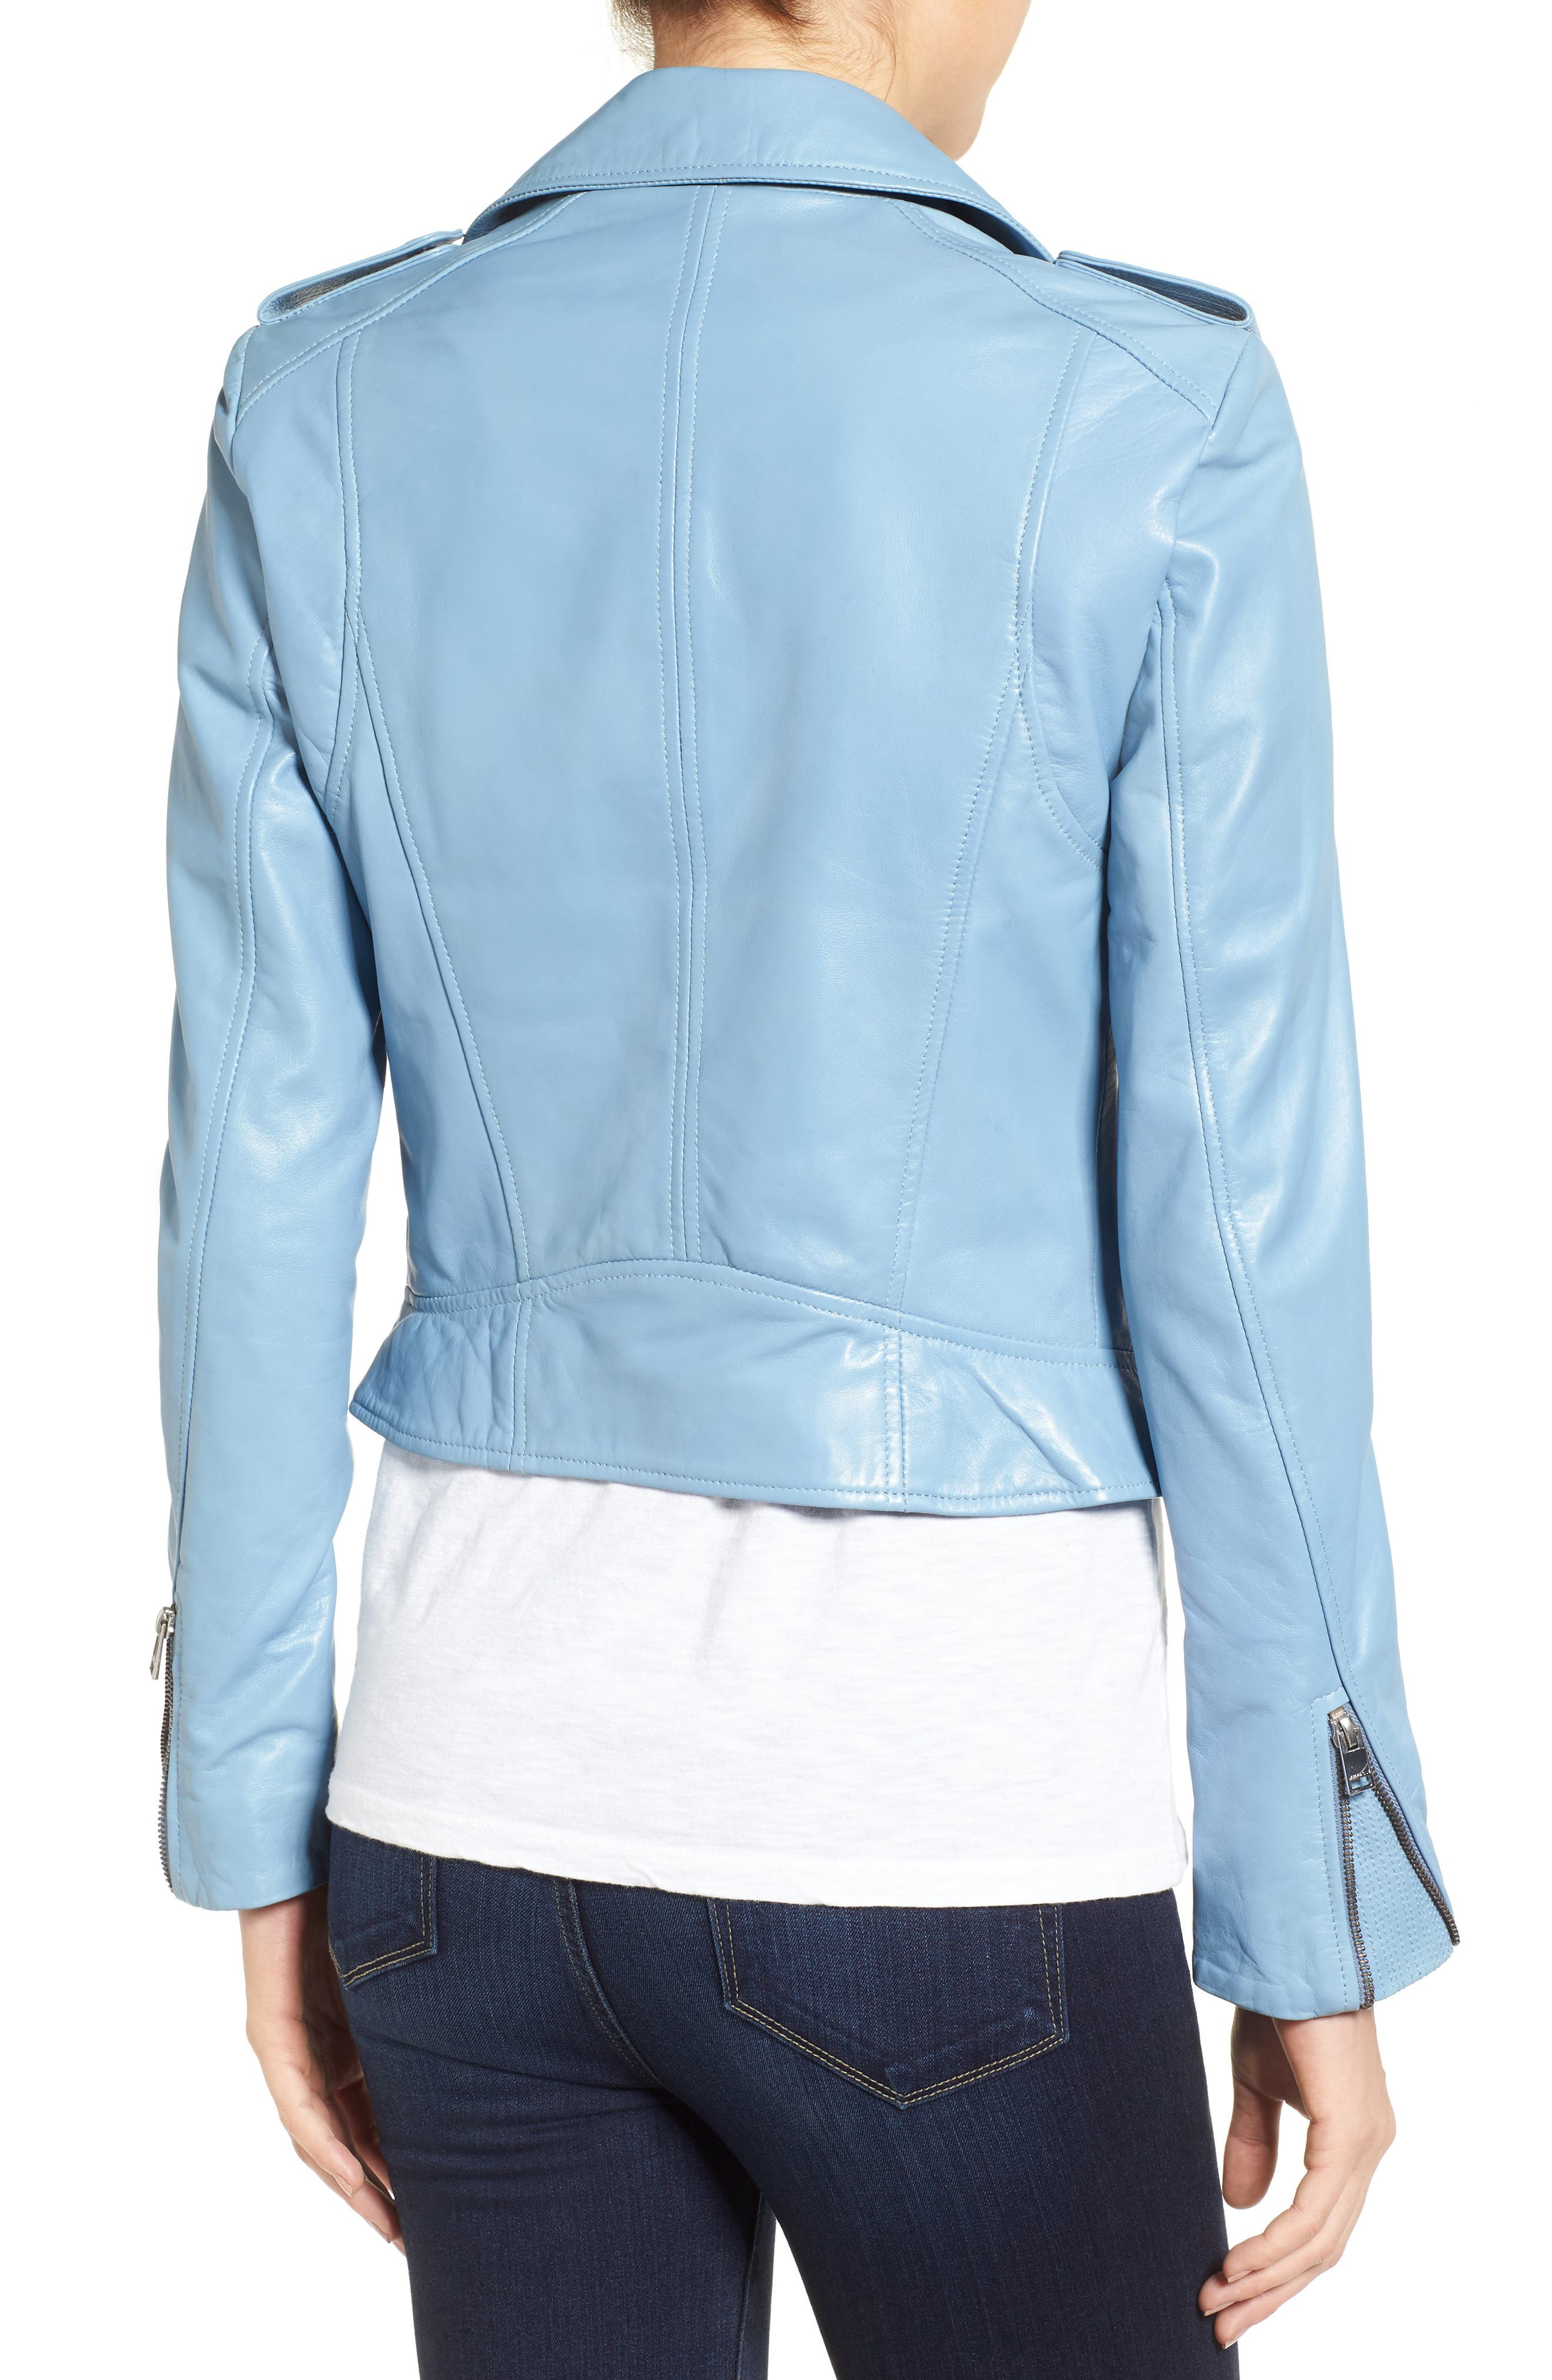 Donna Lambskin Leather Moto Jacket,                             Alternate thumbnail 2, color,                             Powder Blue